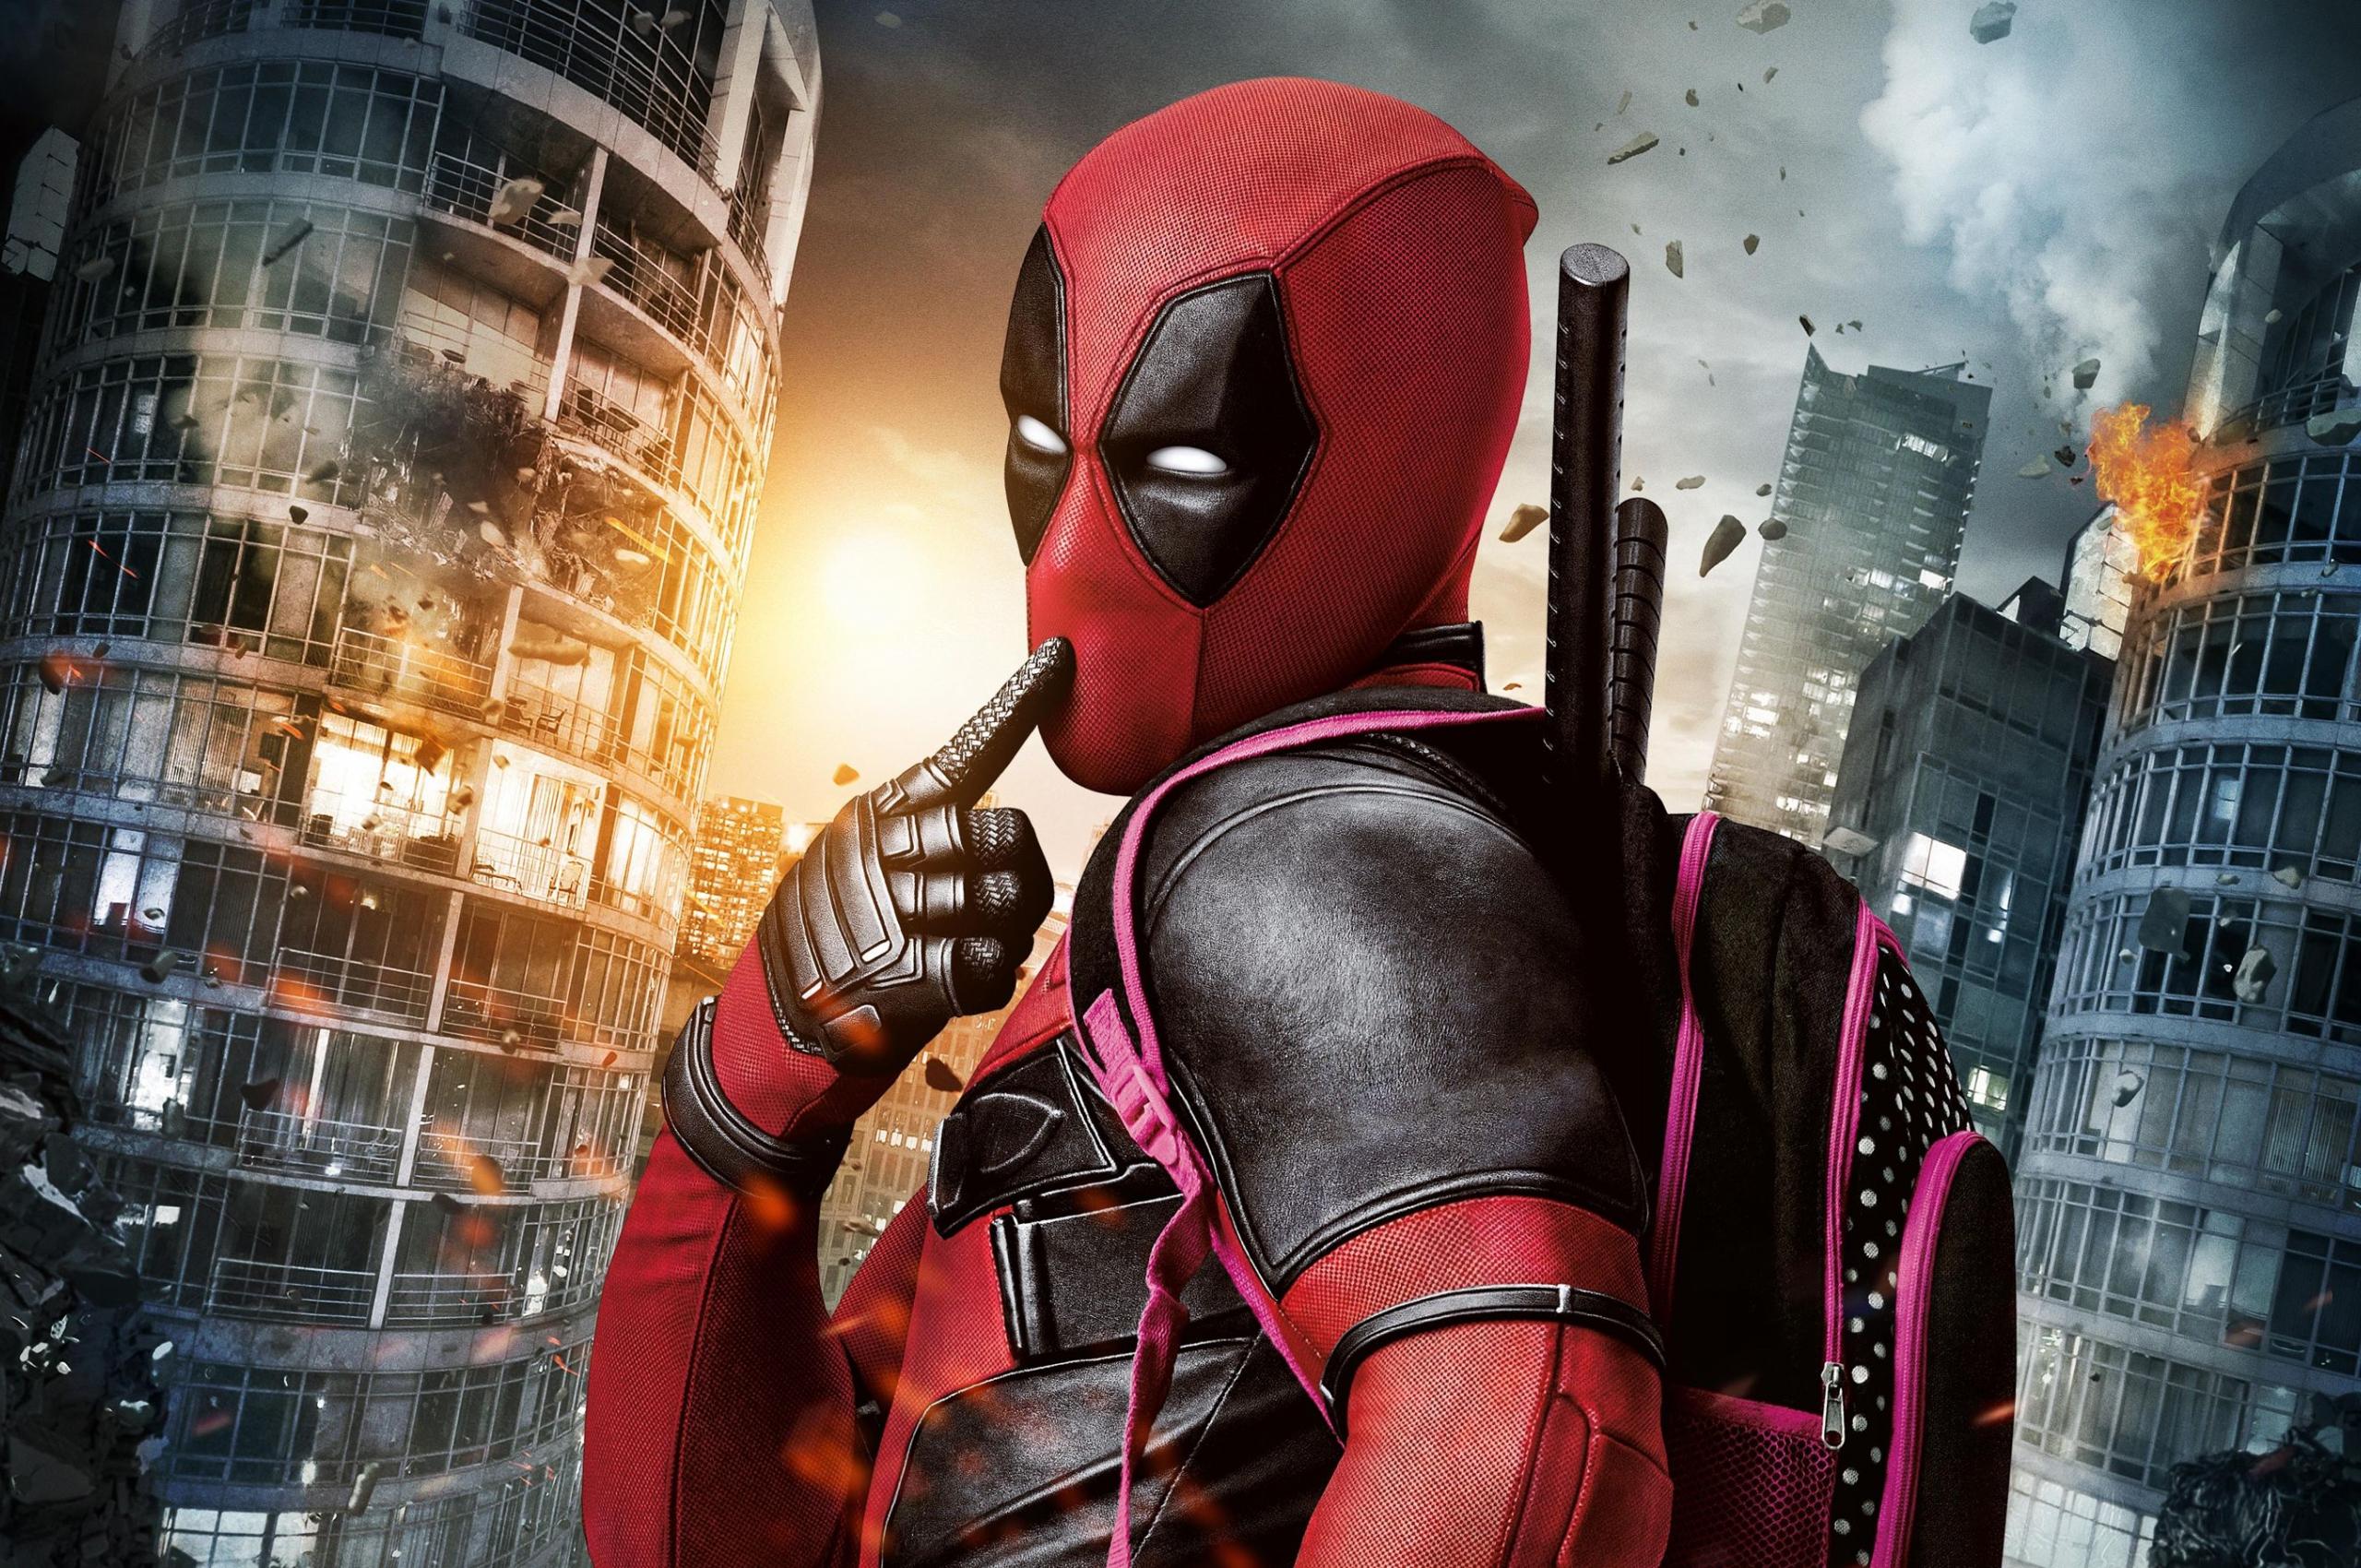 Free Download Deadpool Movie Wallpaper Marvel Deadpool Movie